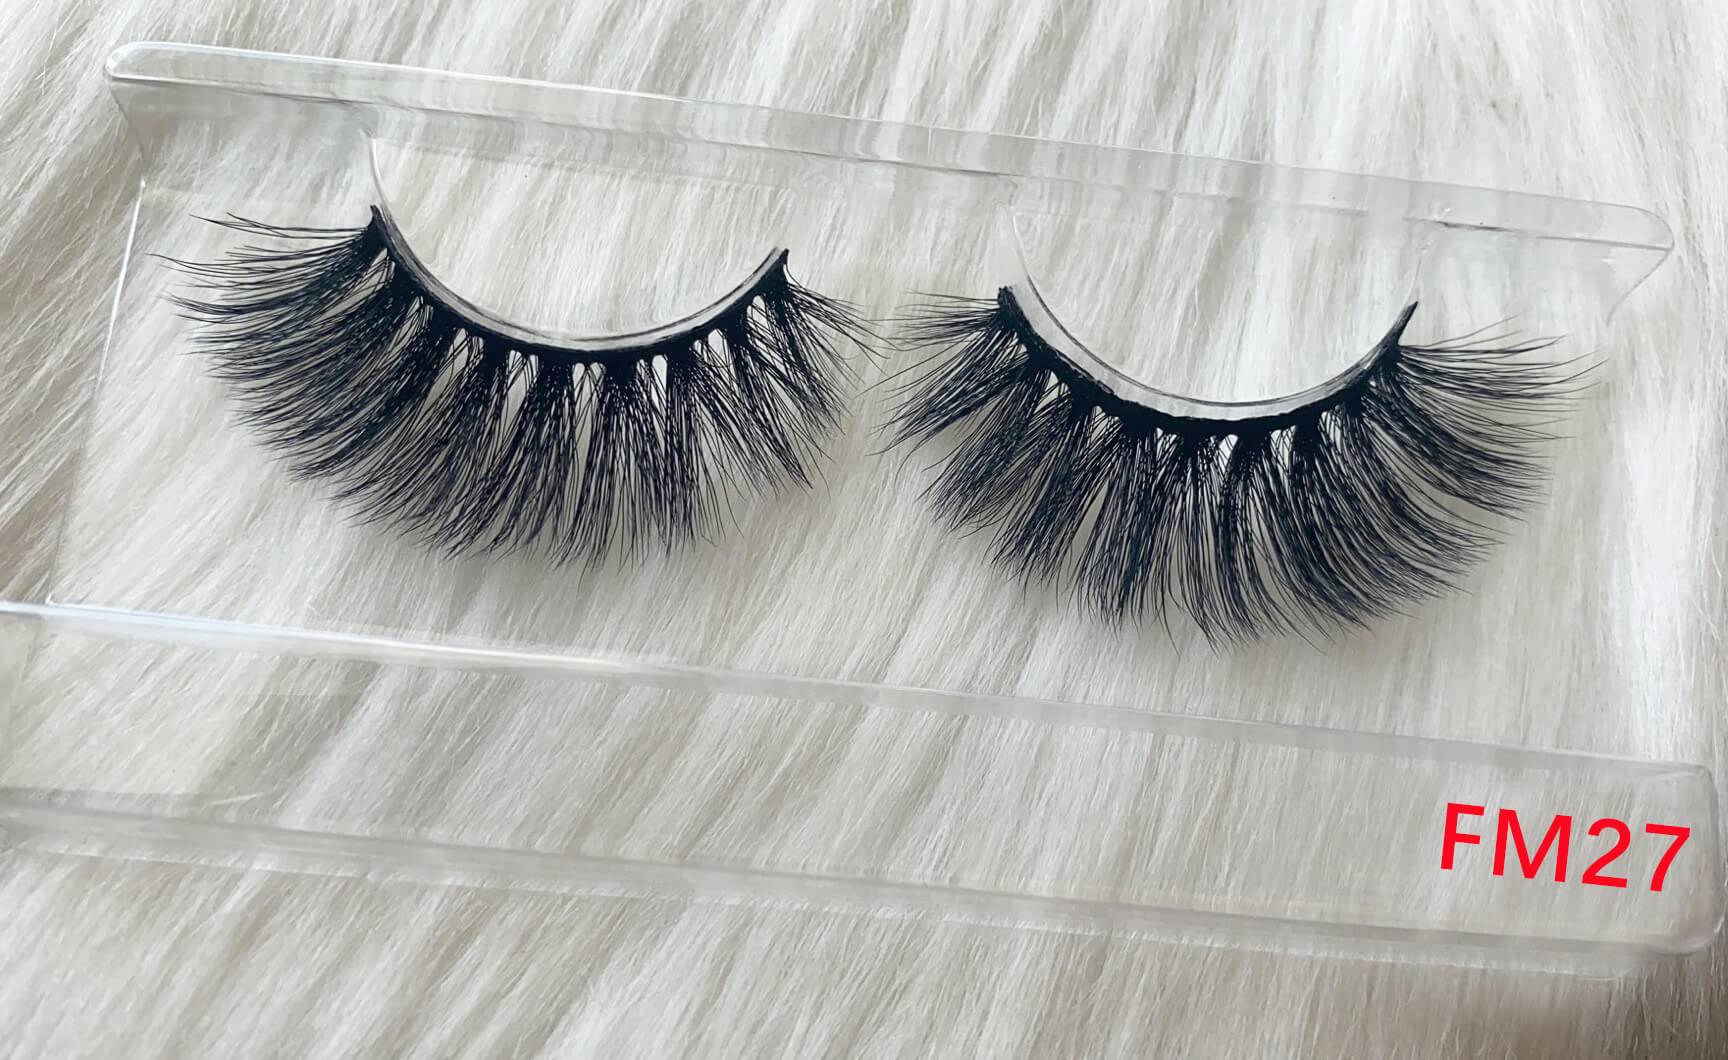 Medium size silk lashes FM27